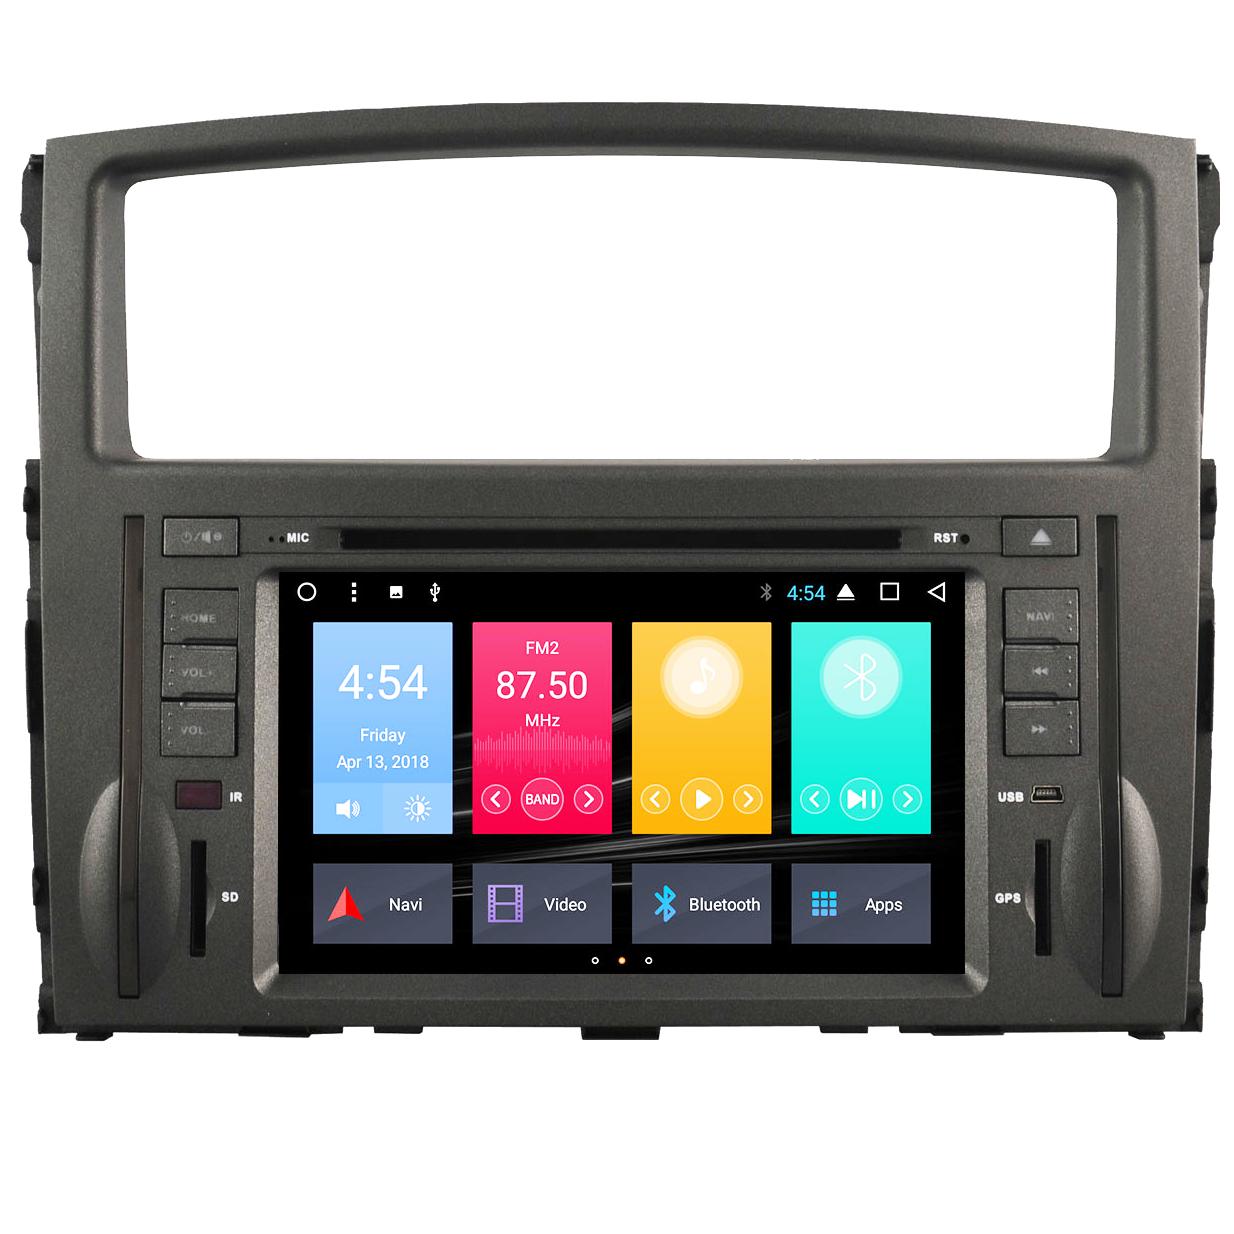 ANDROID autoradio 2 DIN navigatore per Mitsubishi Pajero 2006-2011 GPS DVD WI-FI Bluetooth MirrorLink